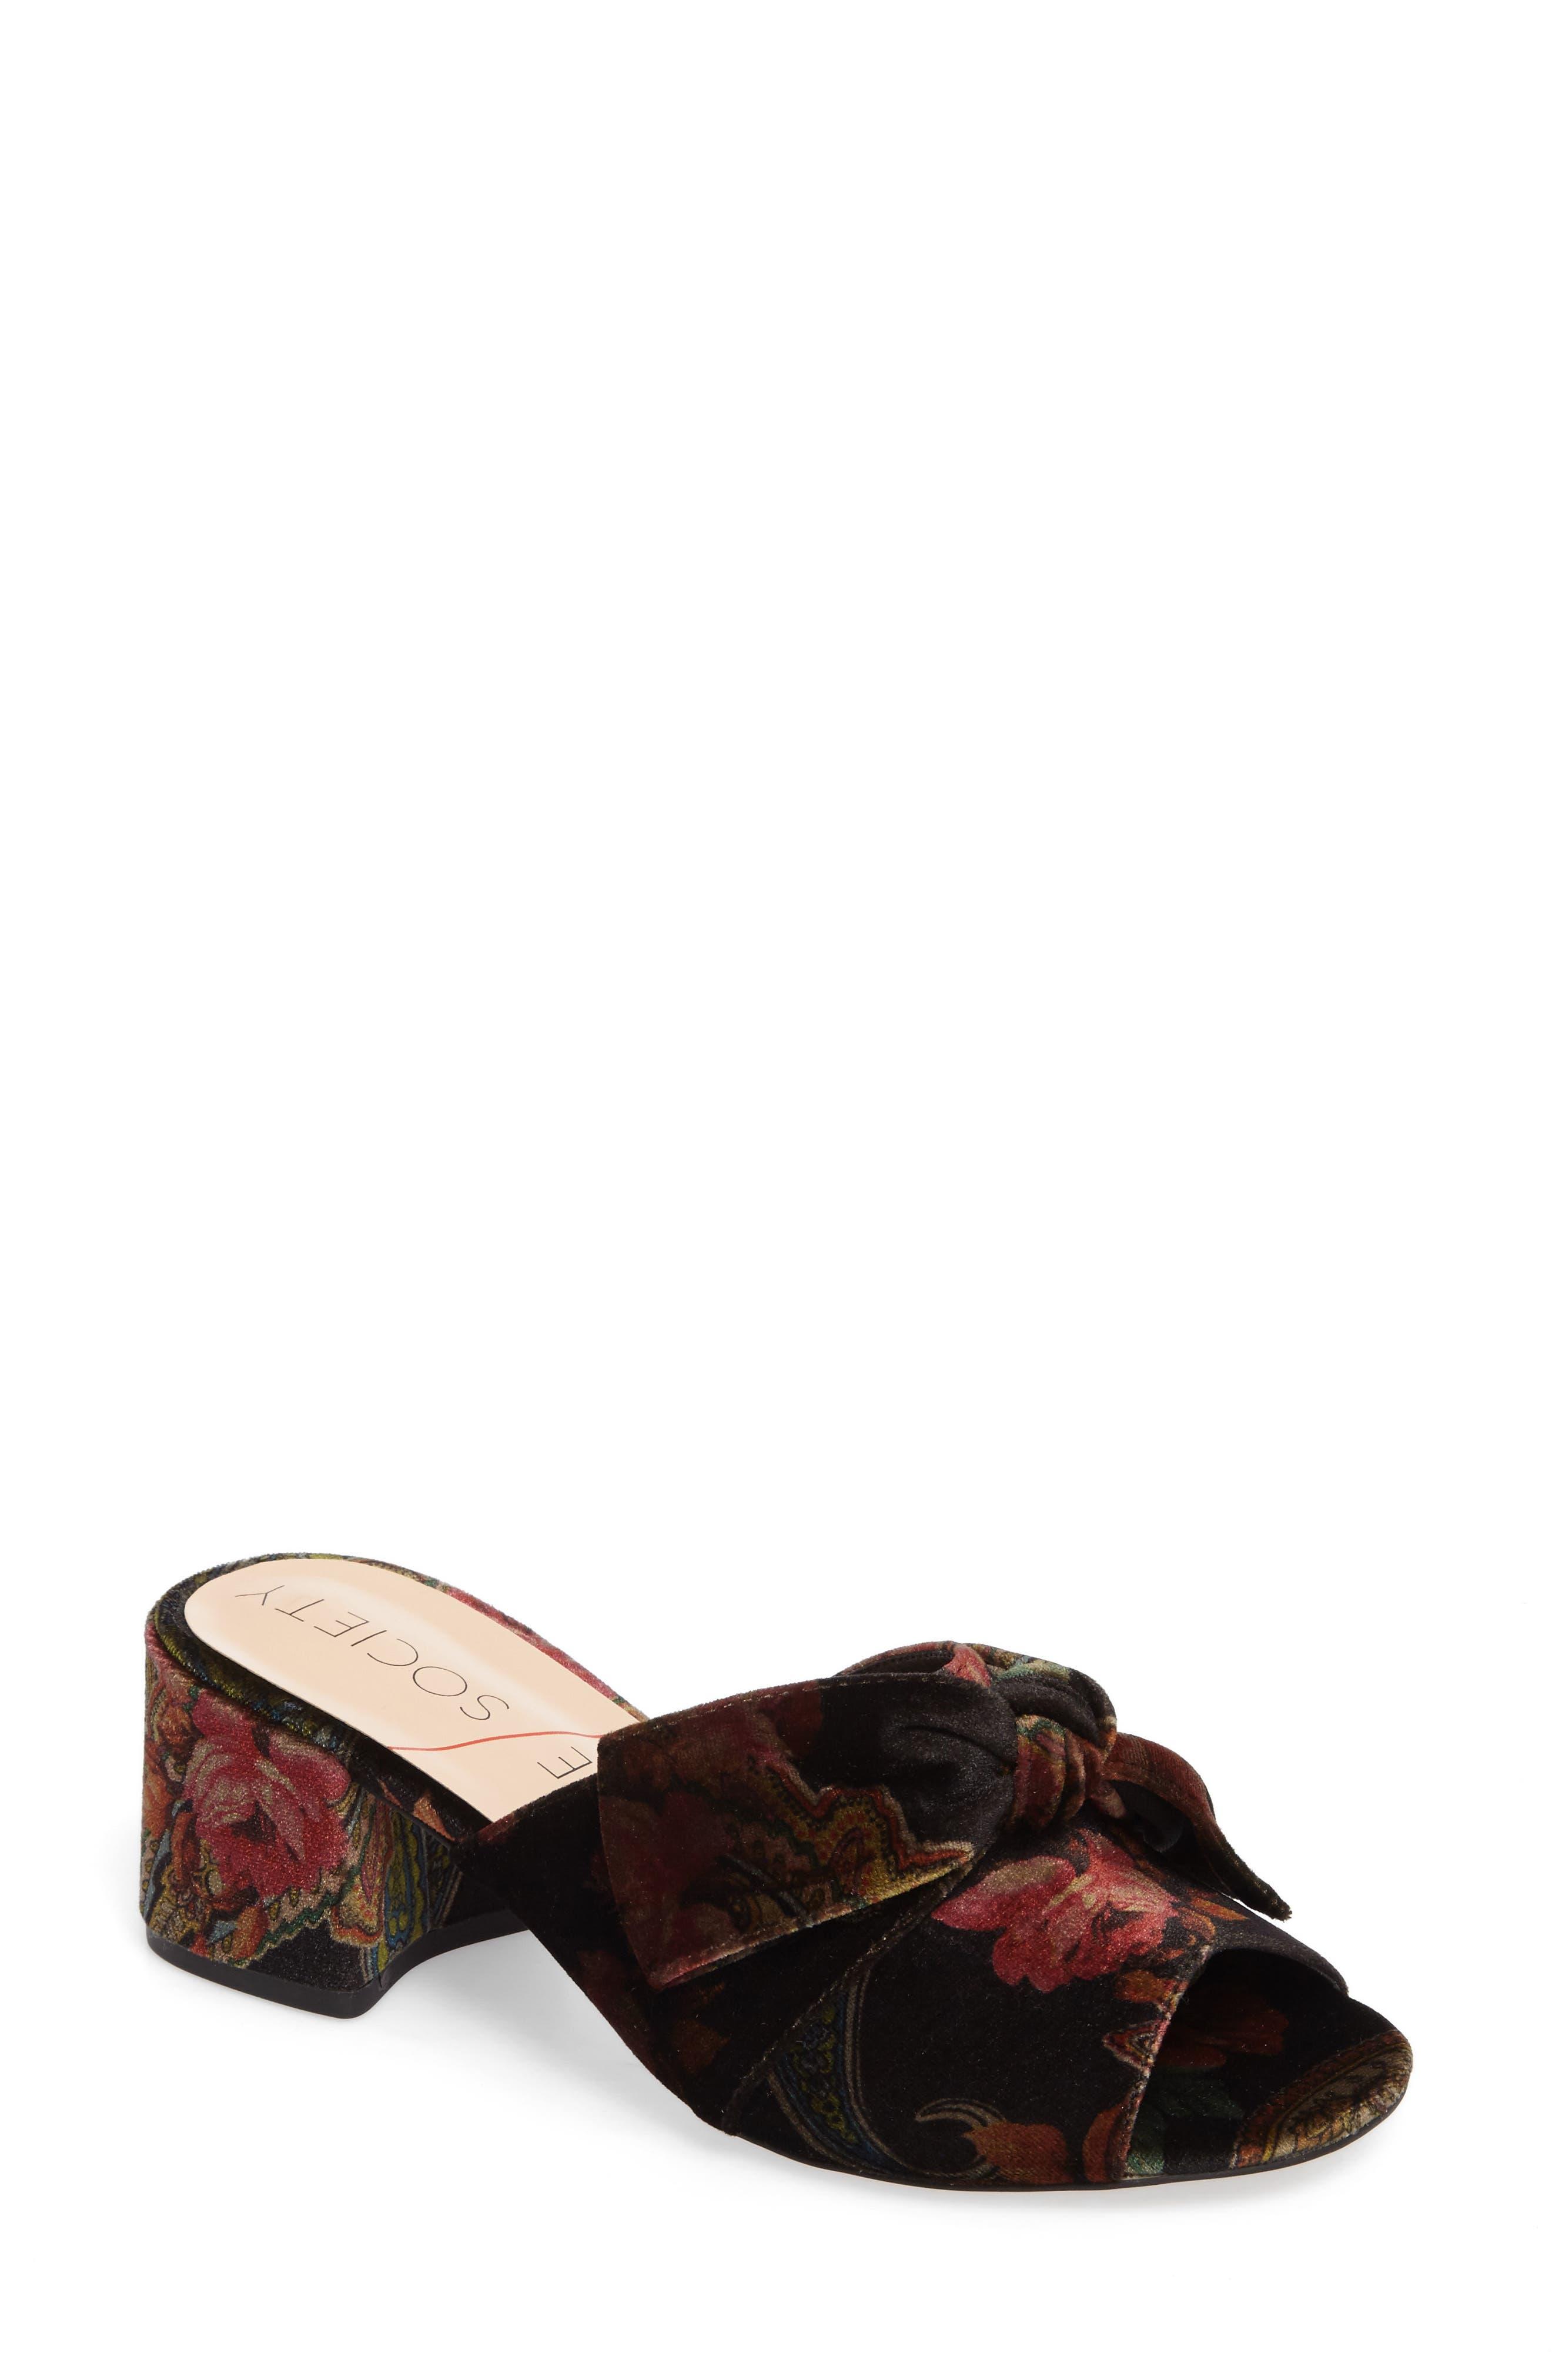 Alternate Image 1 Selected - Sole Society Cece Mule Sandal (Women)